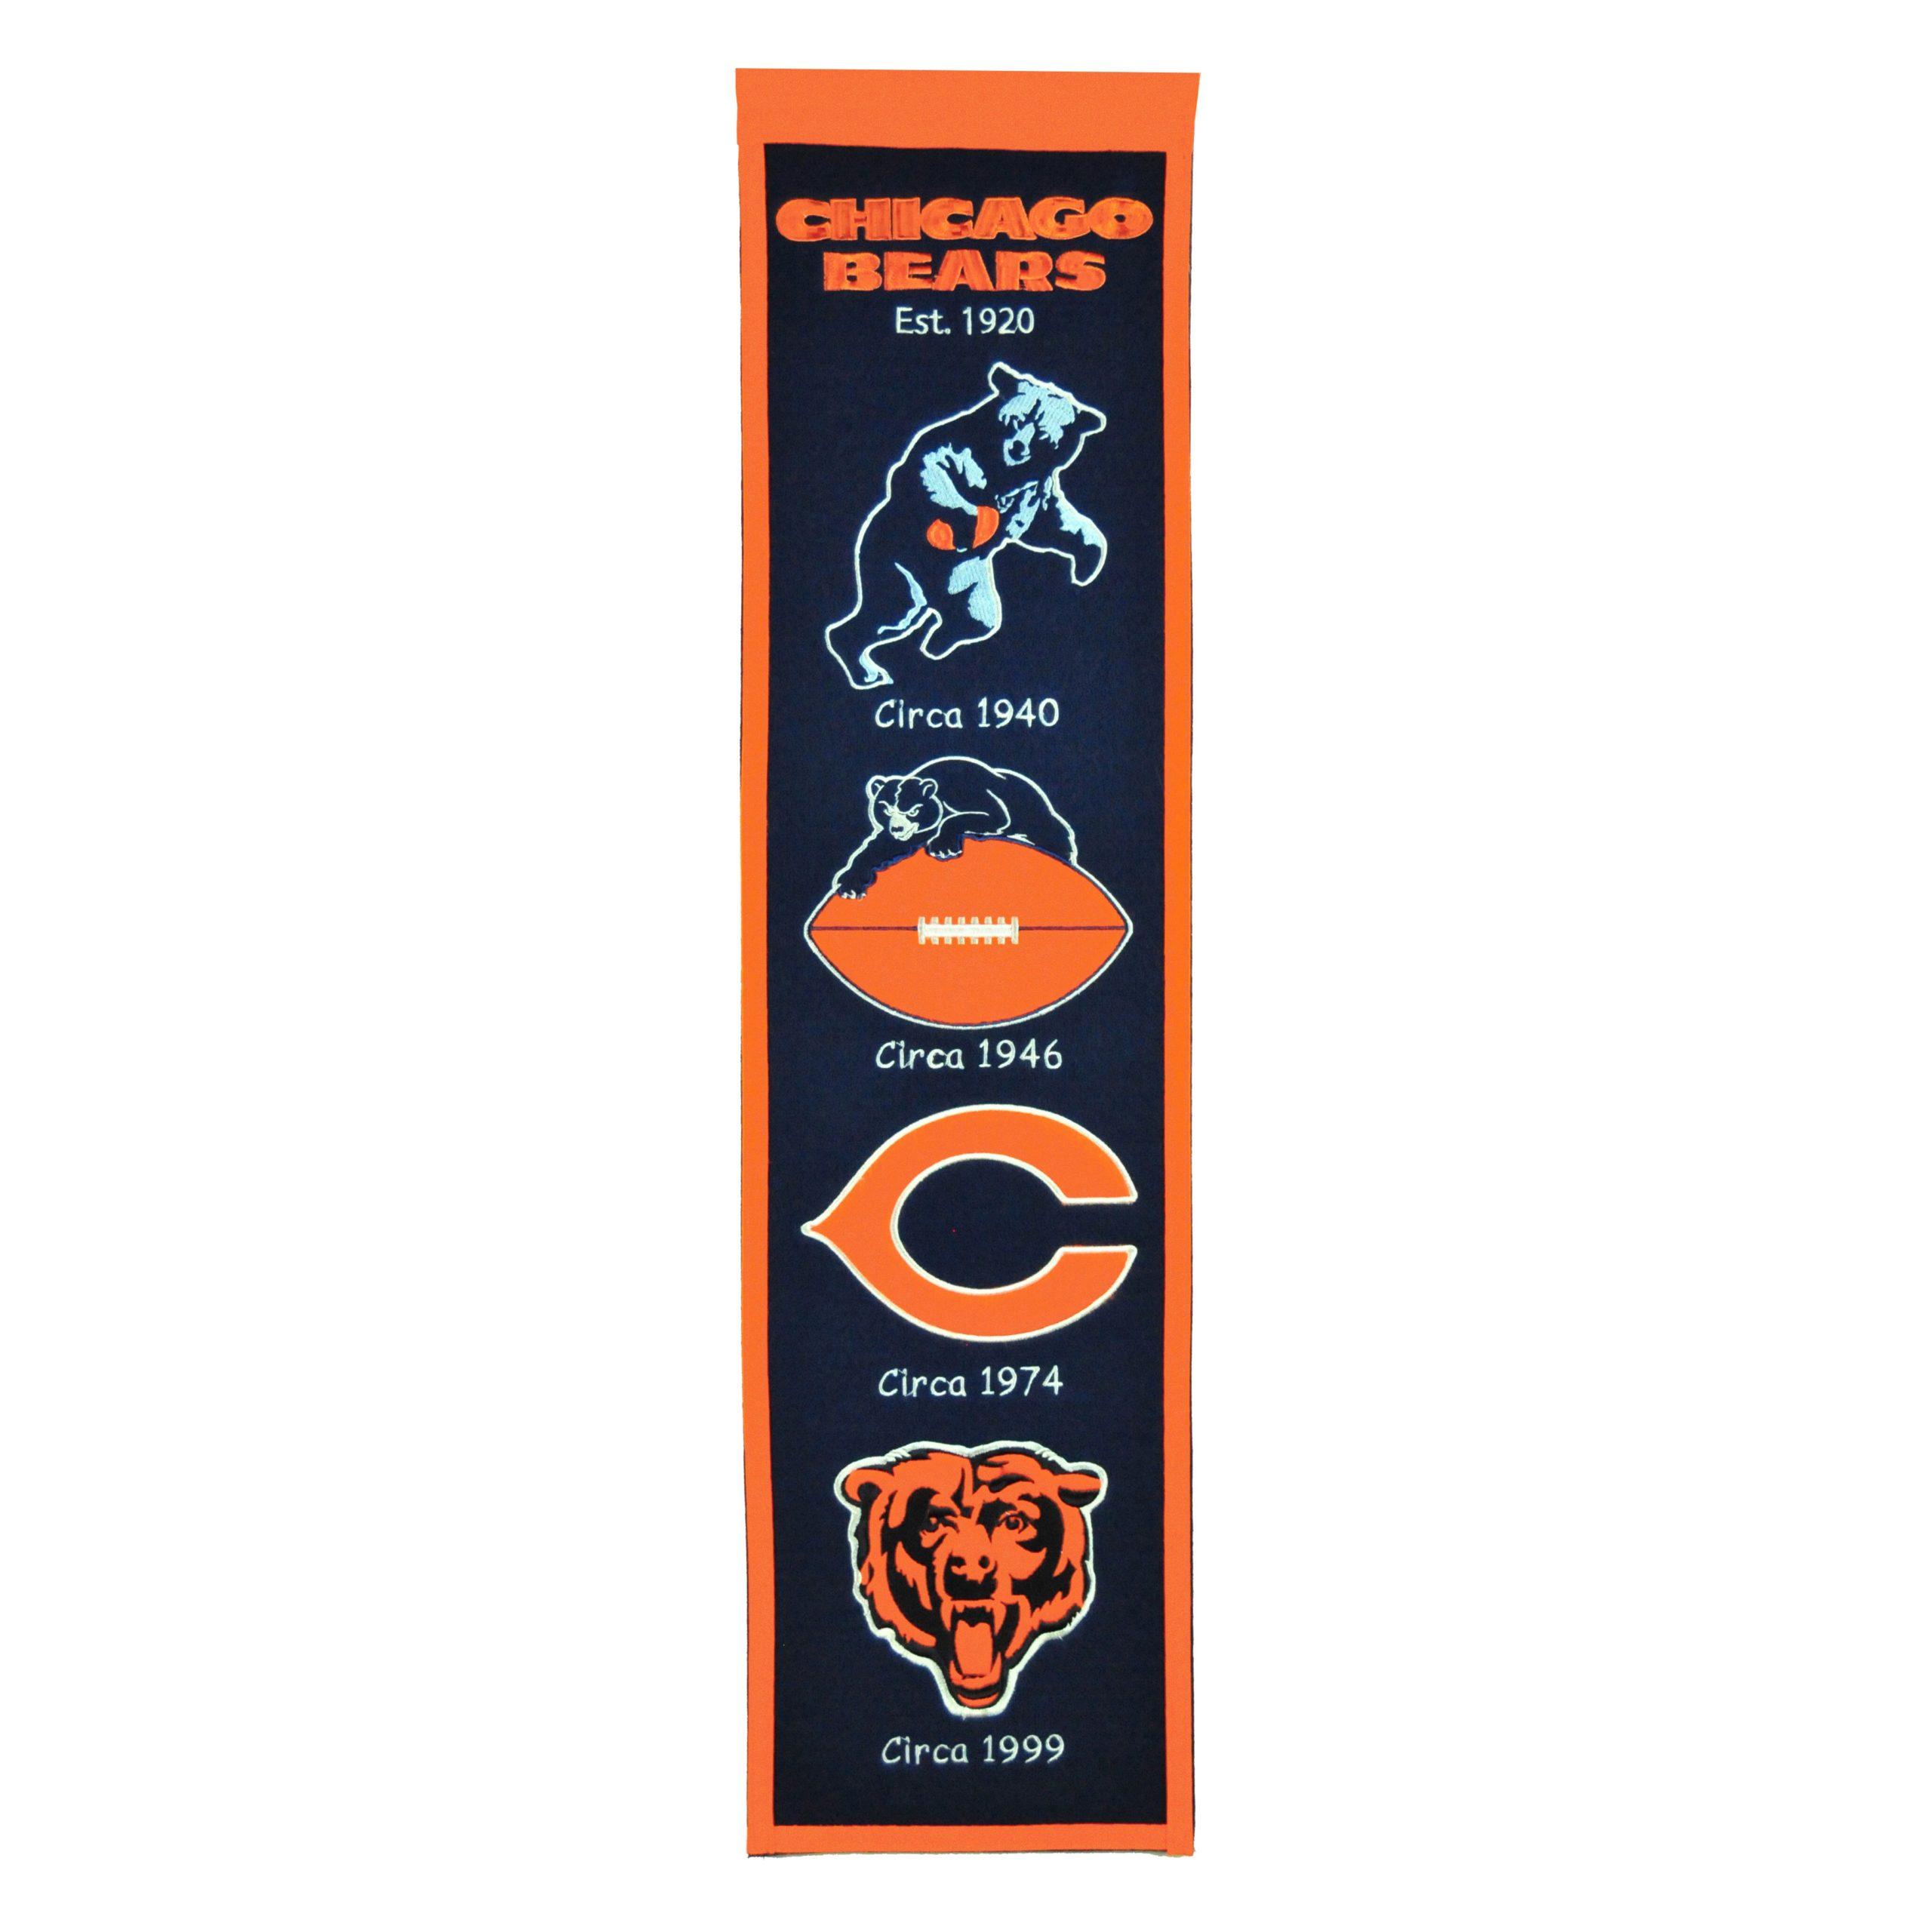 "Chicago Bears 8"" x 32"" Premium Heritage Banner"